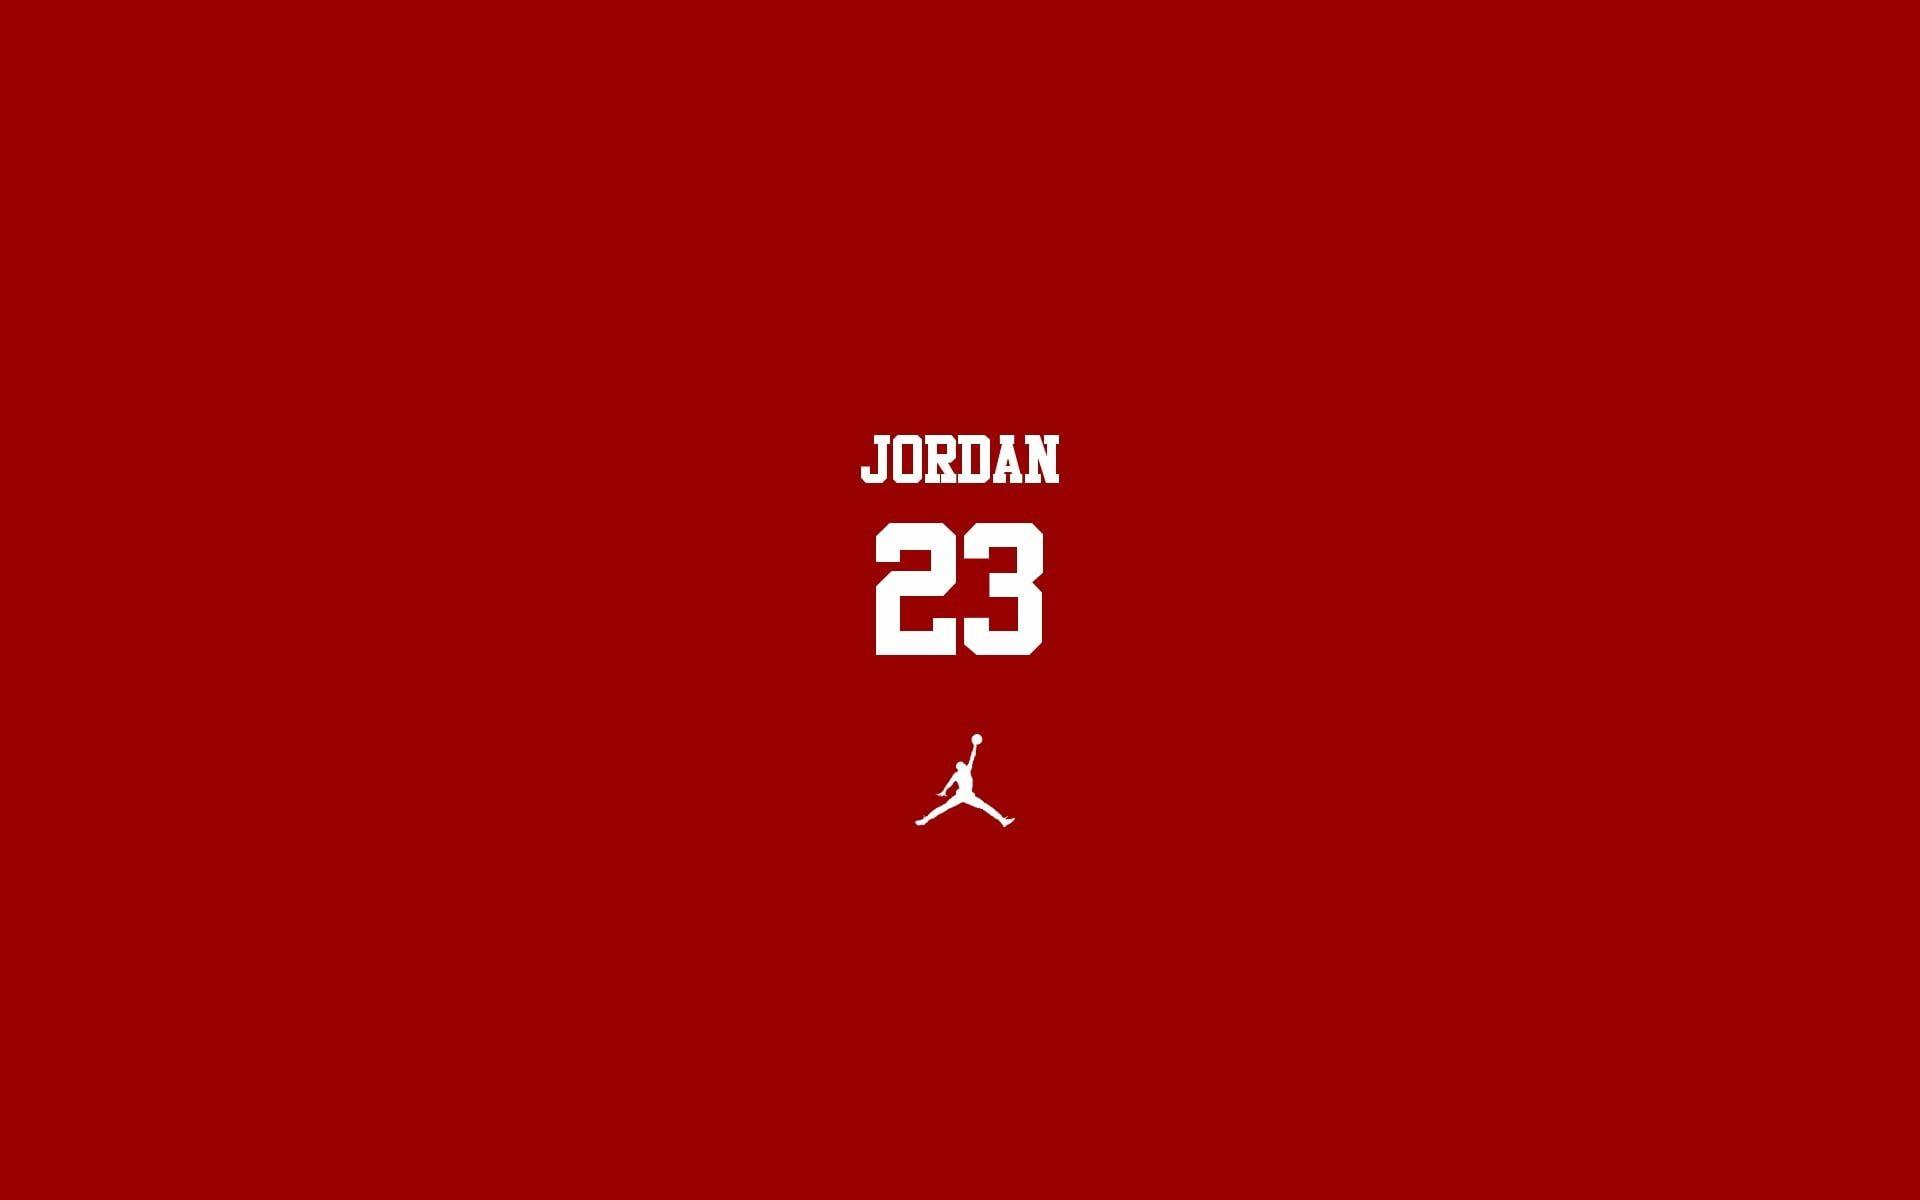 Jordan 23 Wallpaper Michael Jordan Minimalism Numbers Sport Basketball Red Background Simple Backgro In 2020 Jordan Logo Wallpaper Michael Jordan Logo Wallpaper Hd